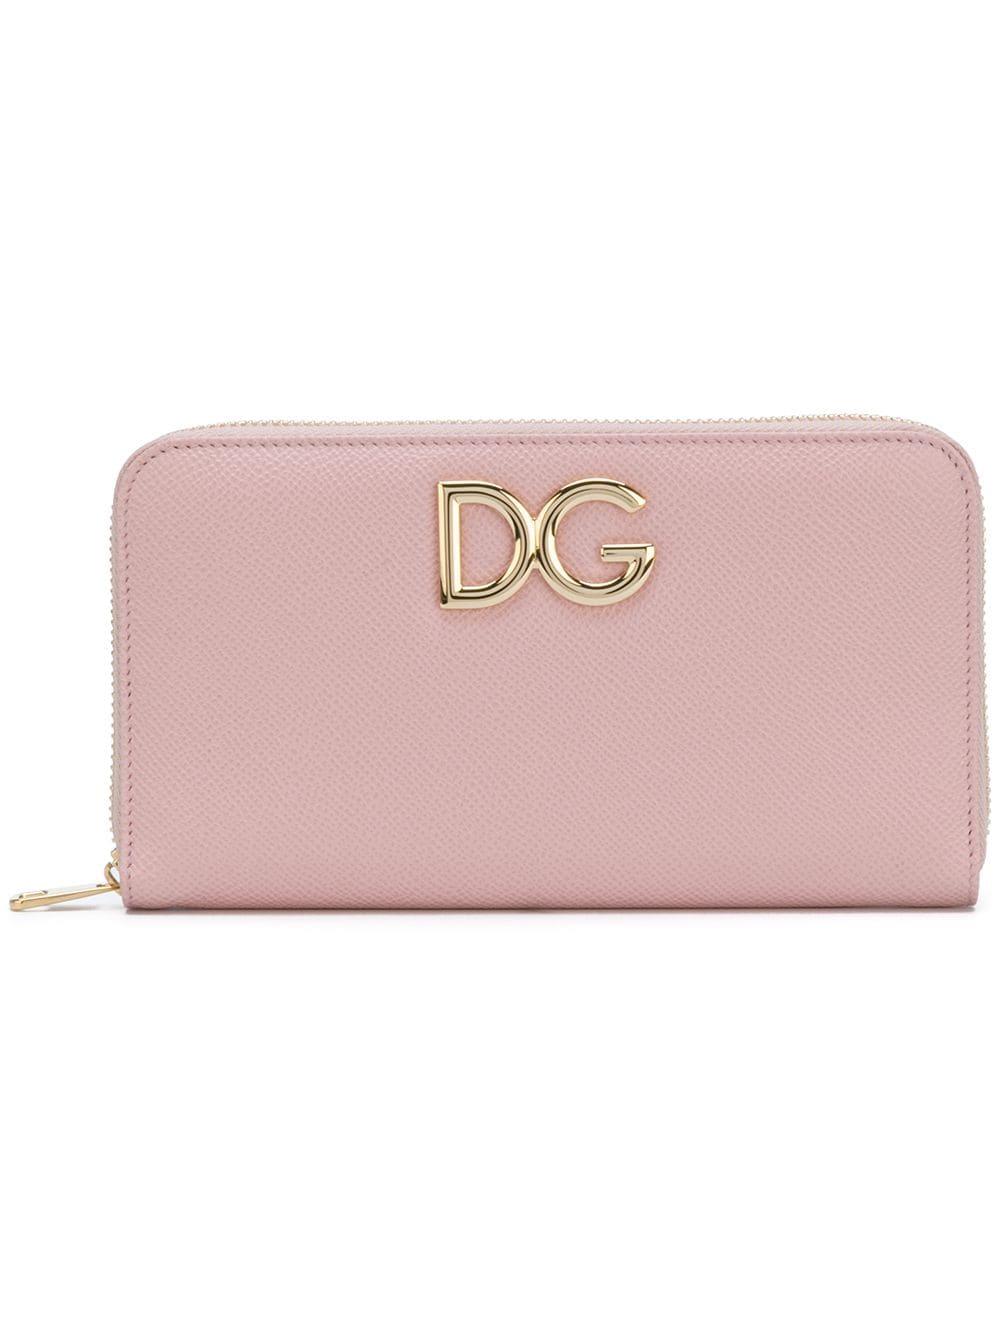 Dolce & Gabbana | кошелек с логотипом | Clouty